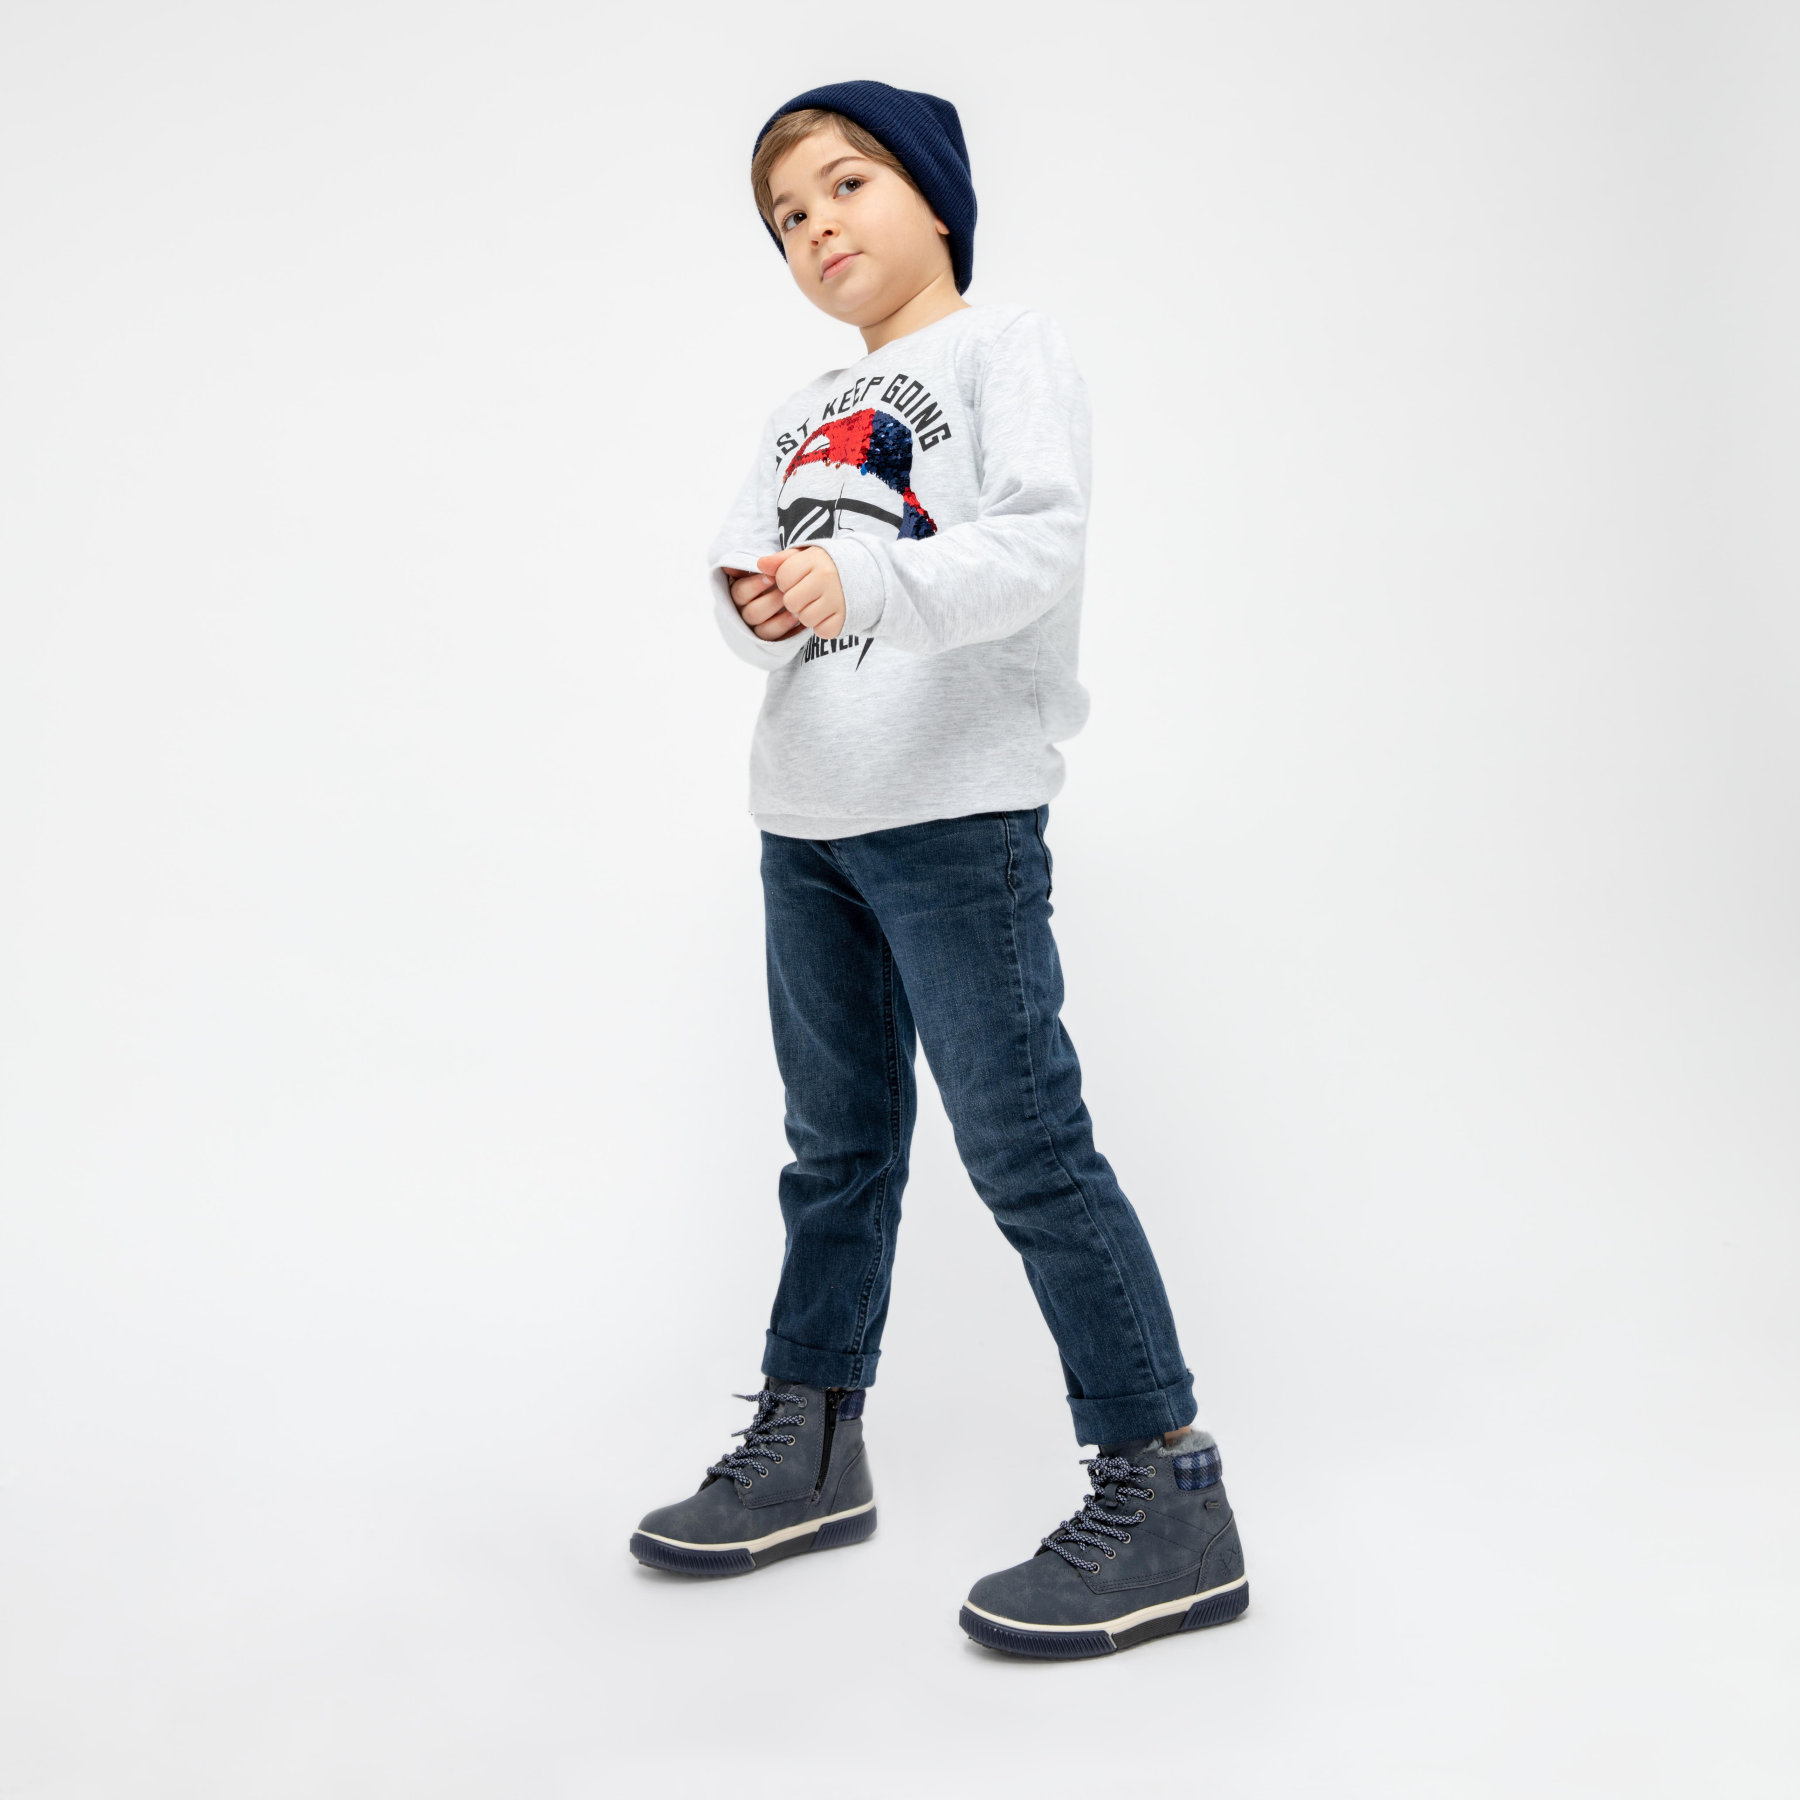 FLO LUCERNE Navy Blue Male Child Boots KINETIX